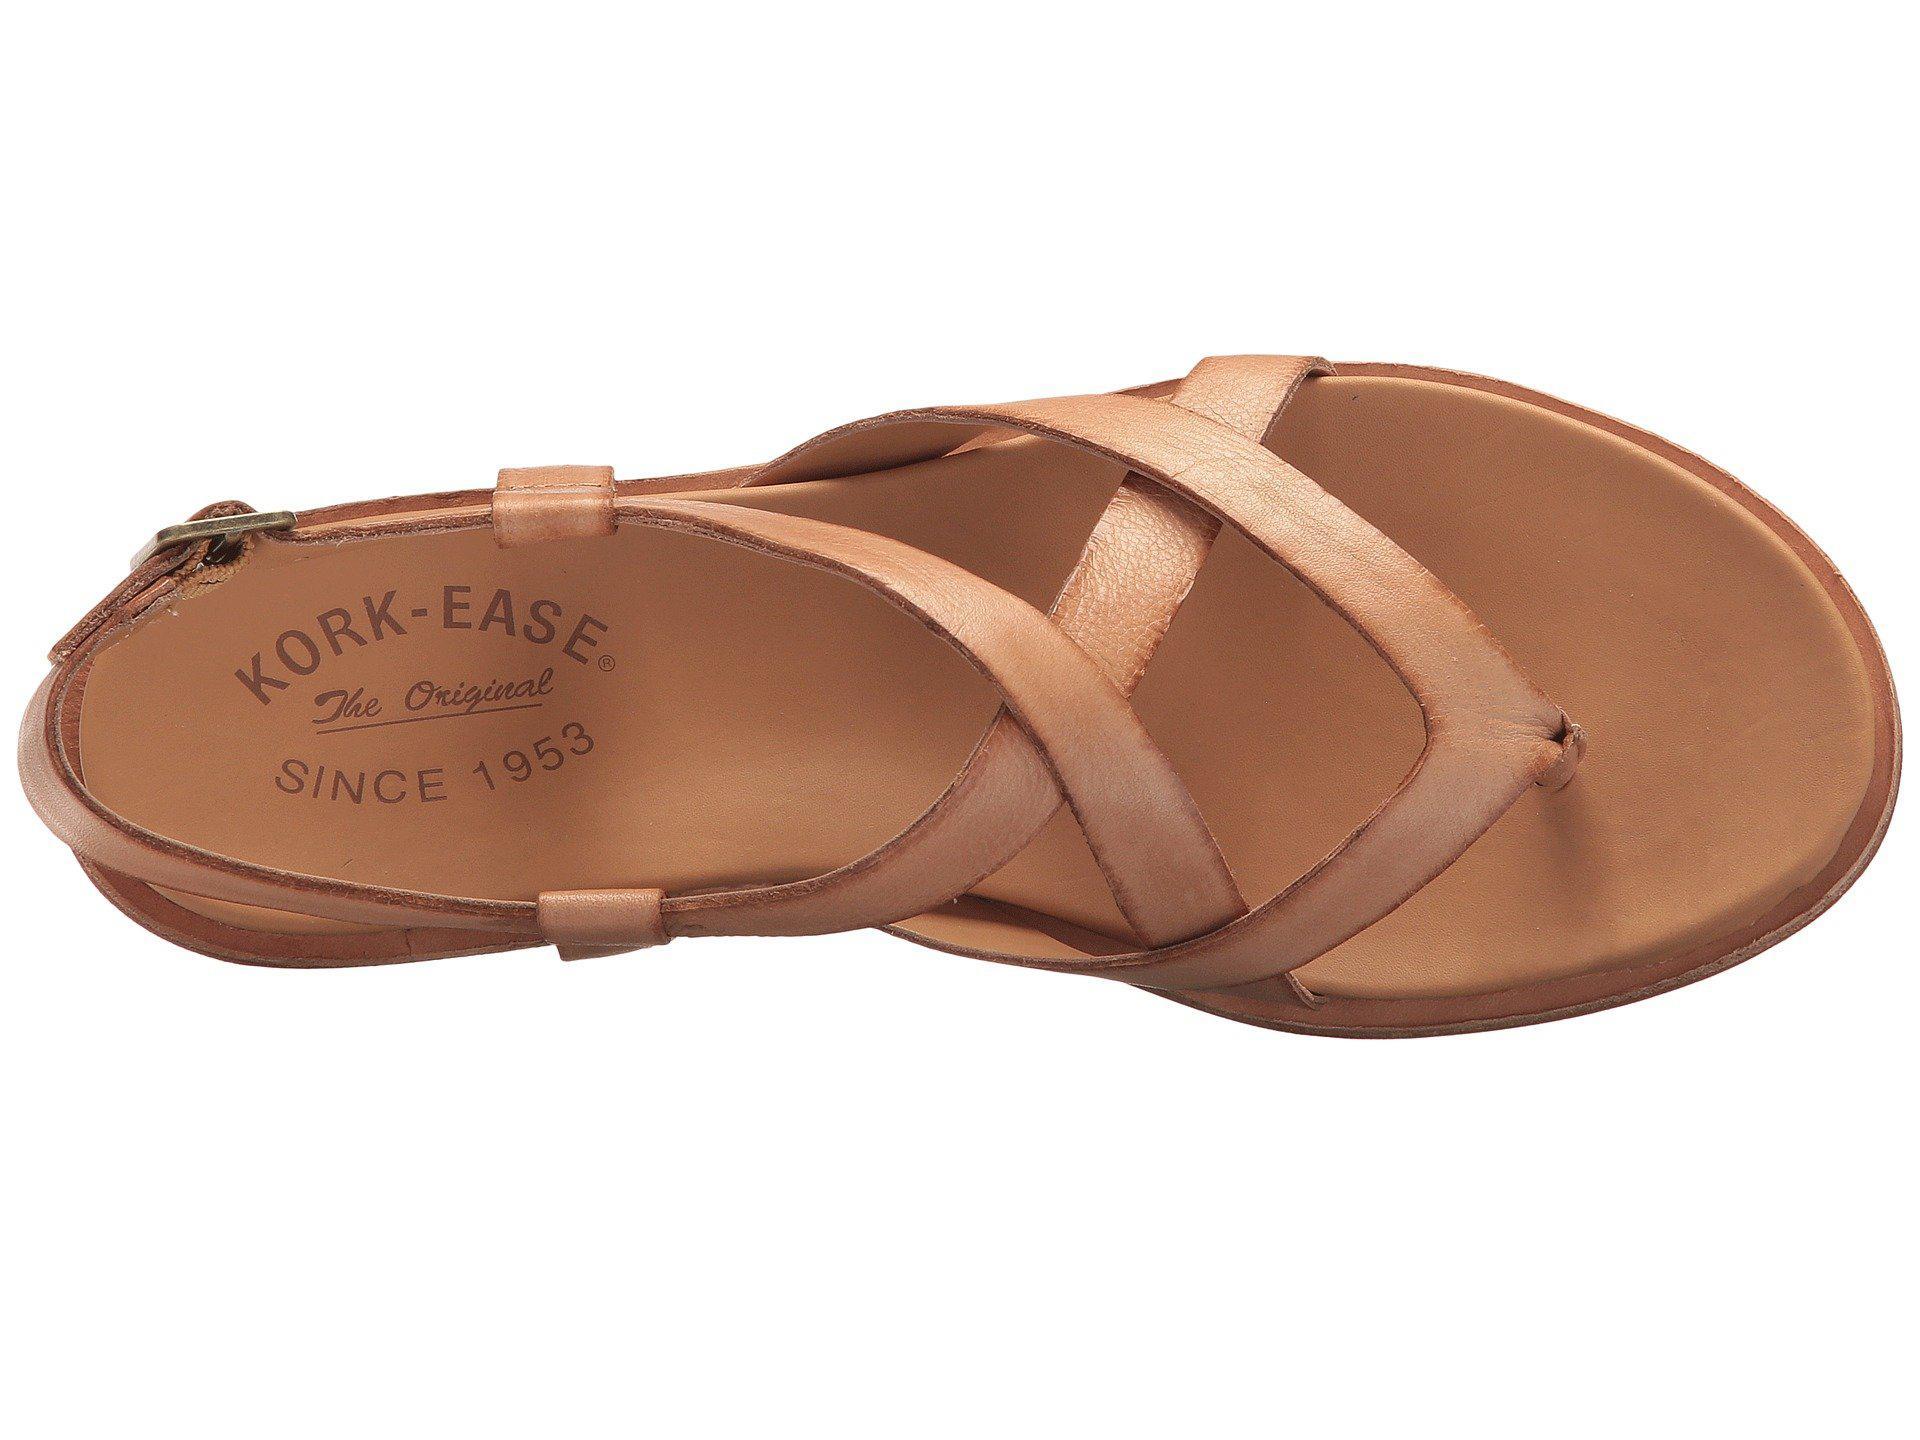 02da95aefd98 Kork-Ease - Yarbrough (brown Full Grain Leather) Women s Sandals - Lyst.  View fullscreen